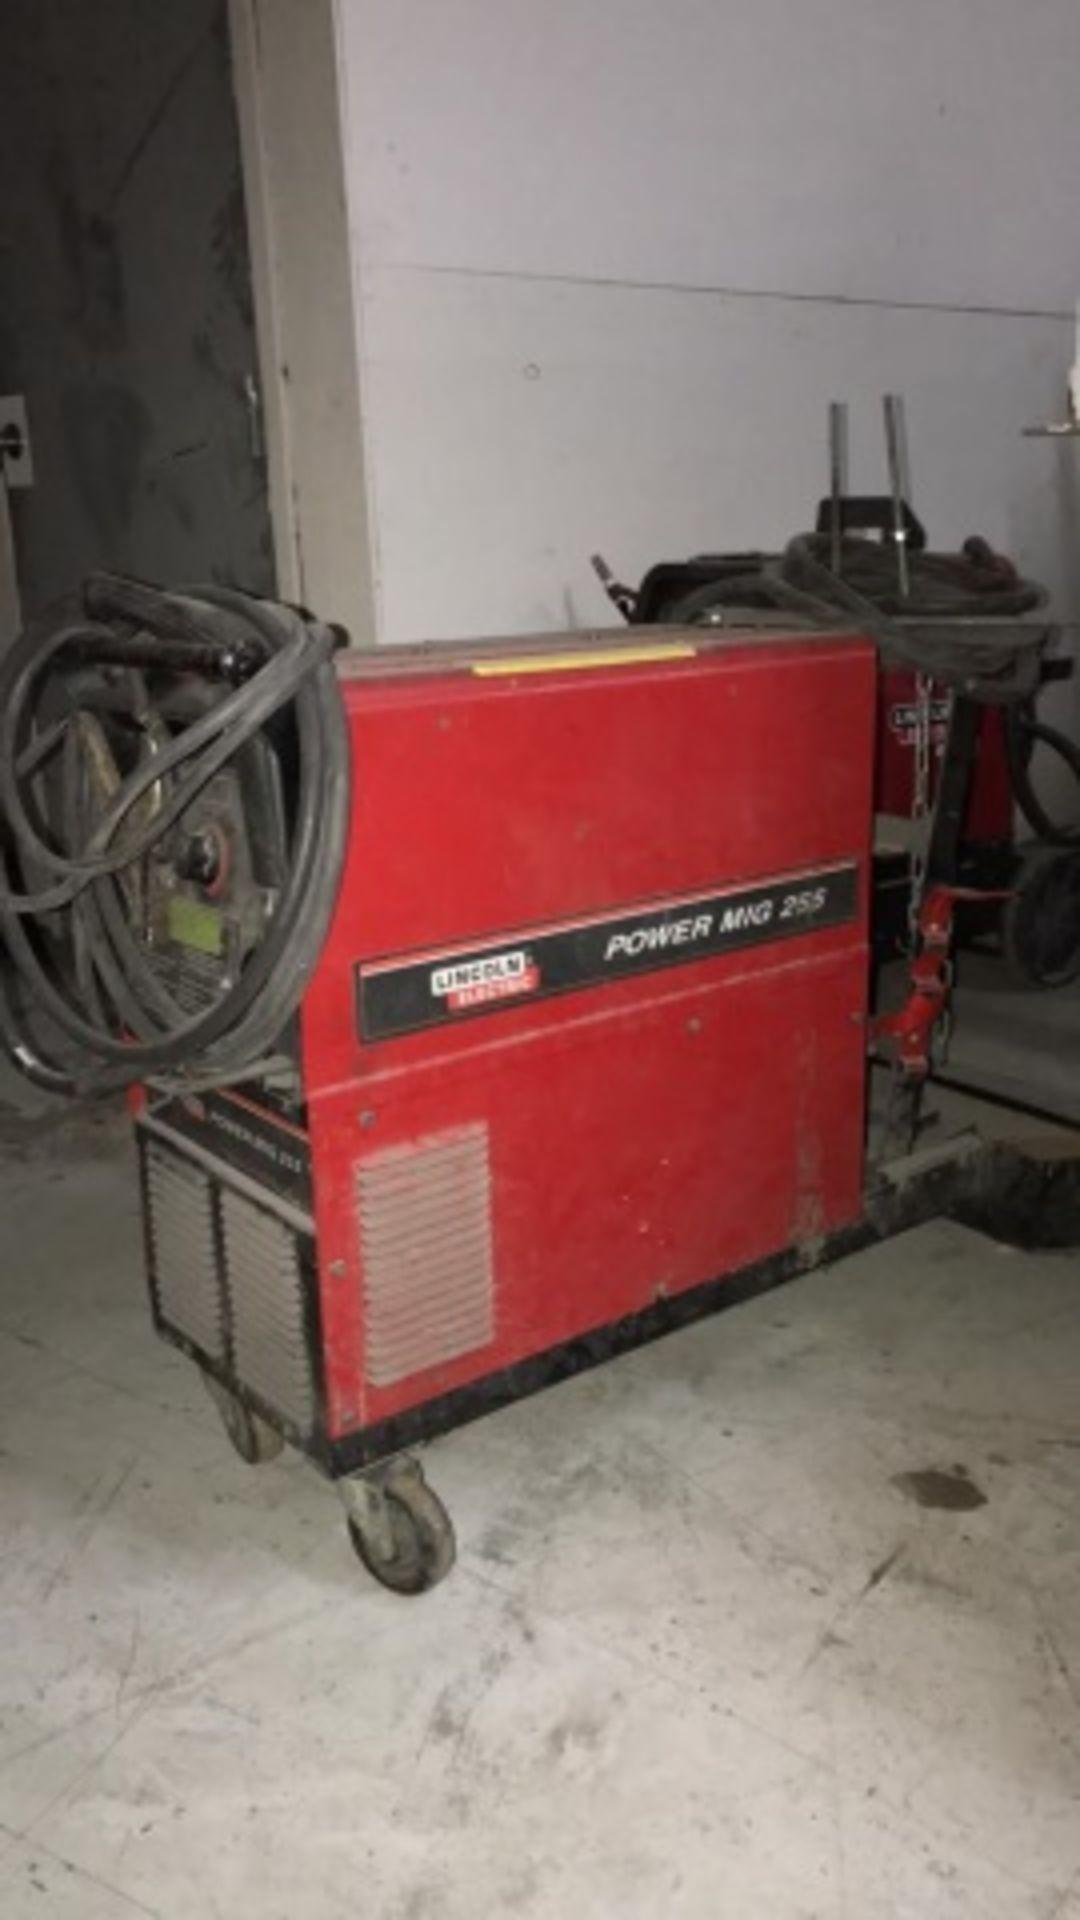 Lincoln Power Mig 255 MIG Welder - Image 2 of 2